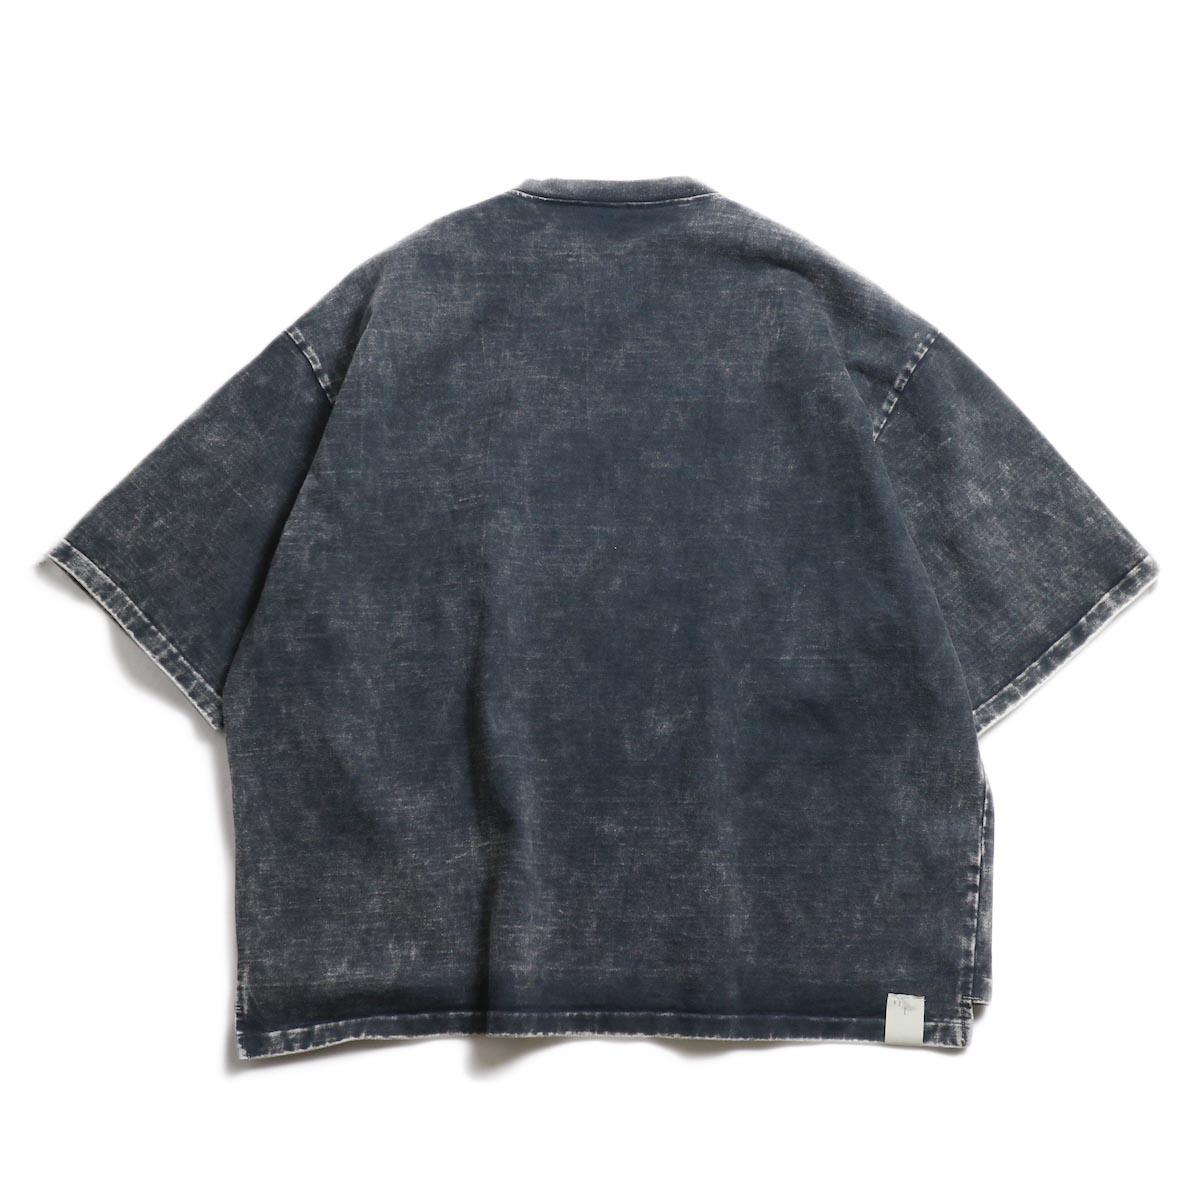 N.HOOLYWOOD × Gramicci  / 191-CS27-024 Short Sleeve Tee -Black 背面